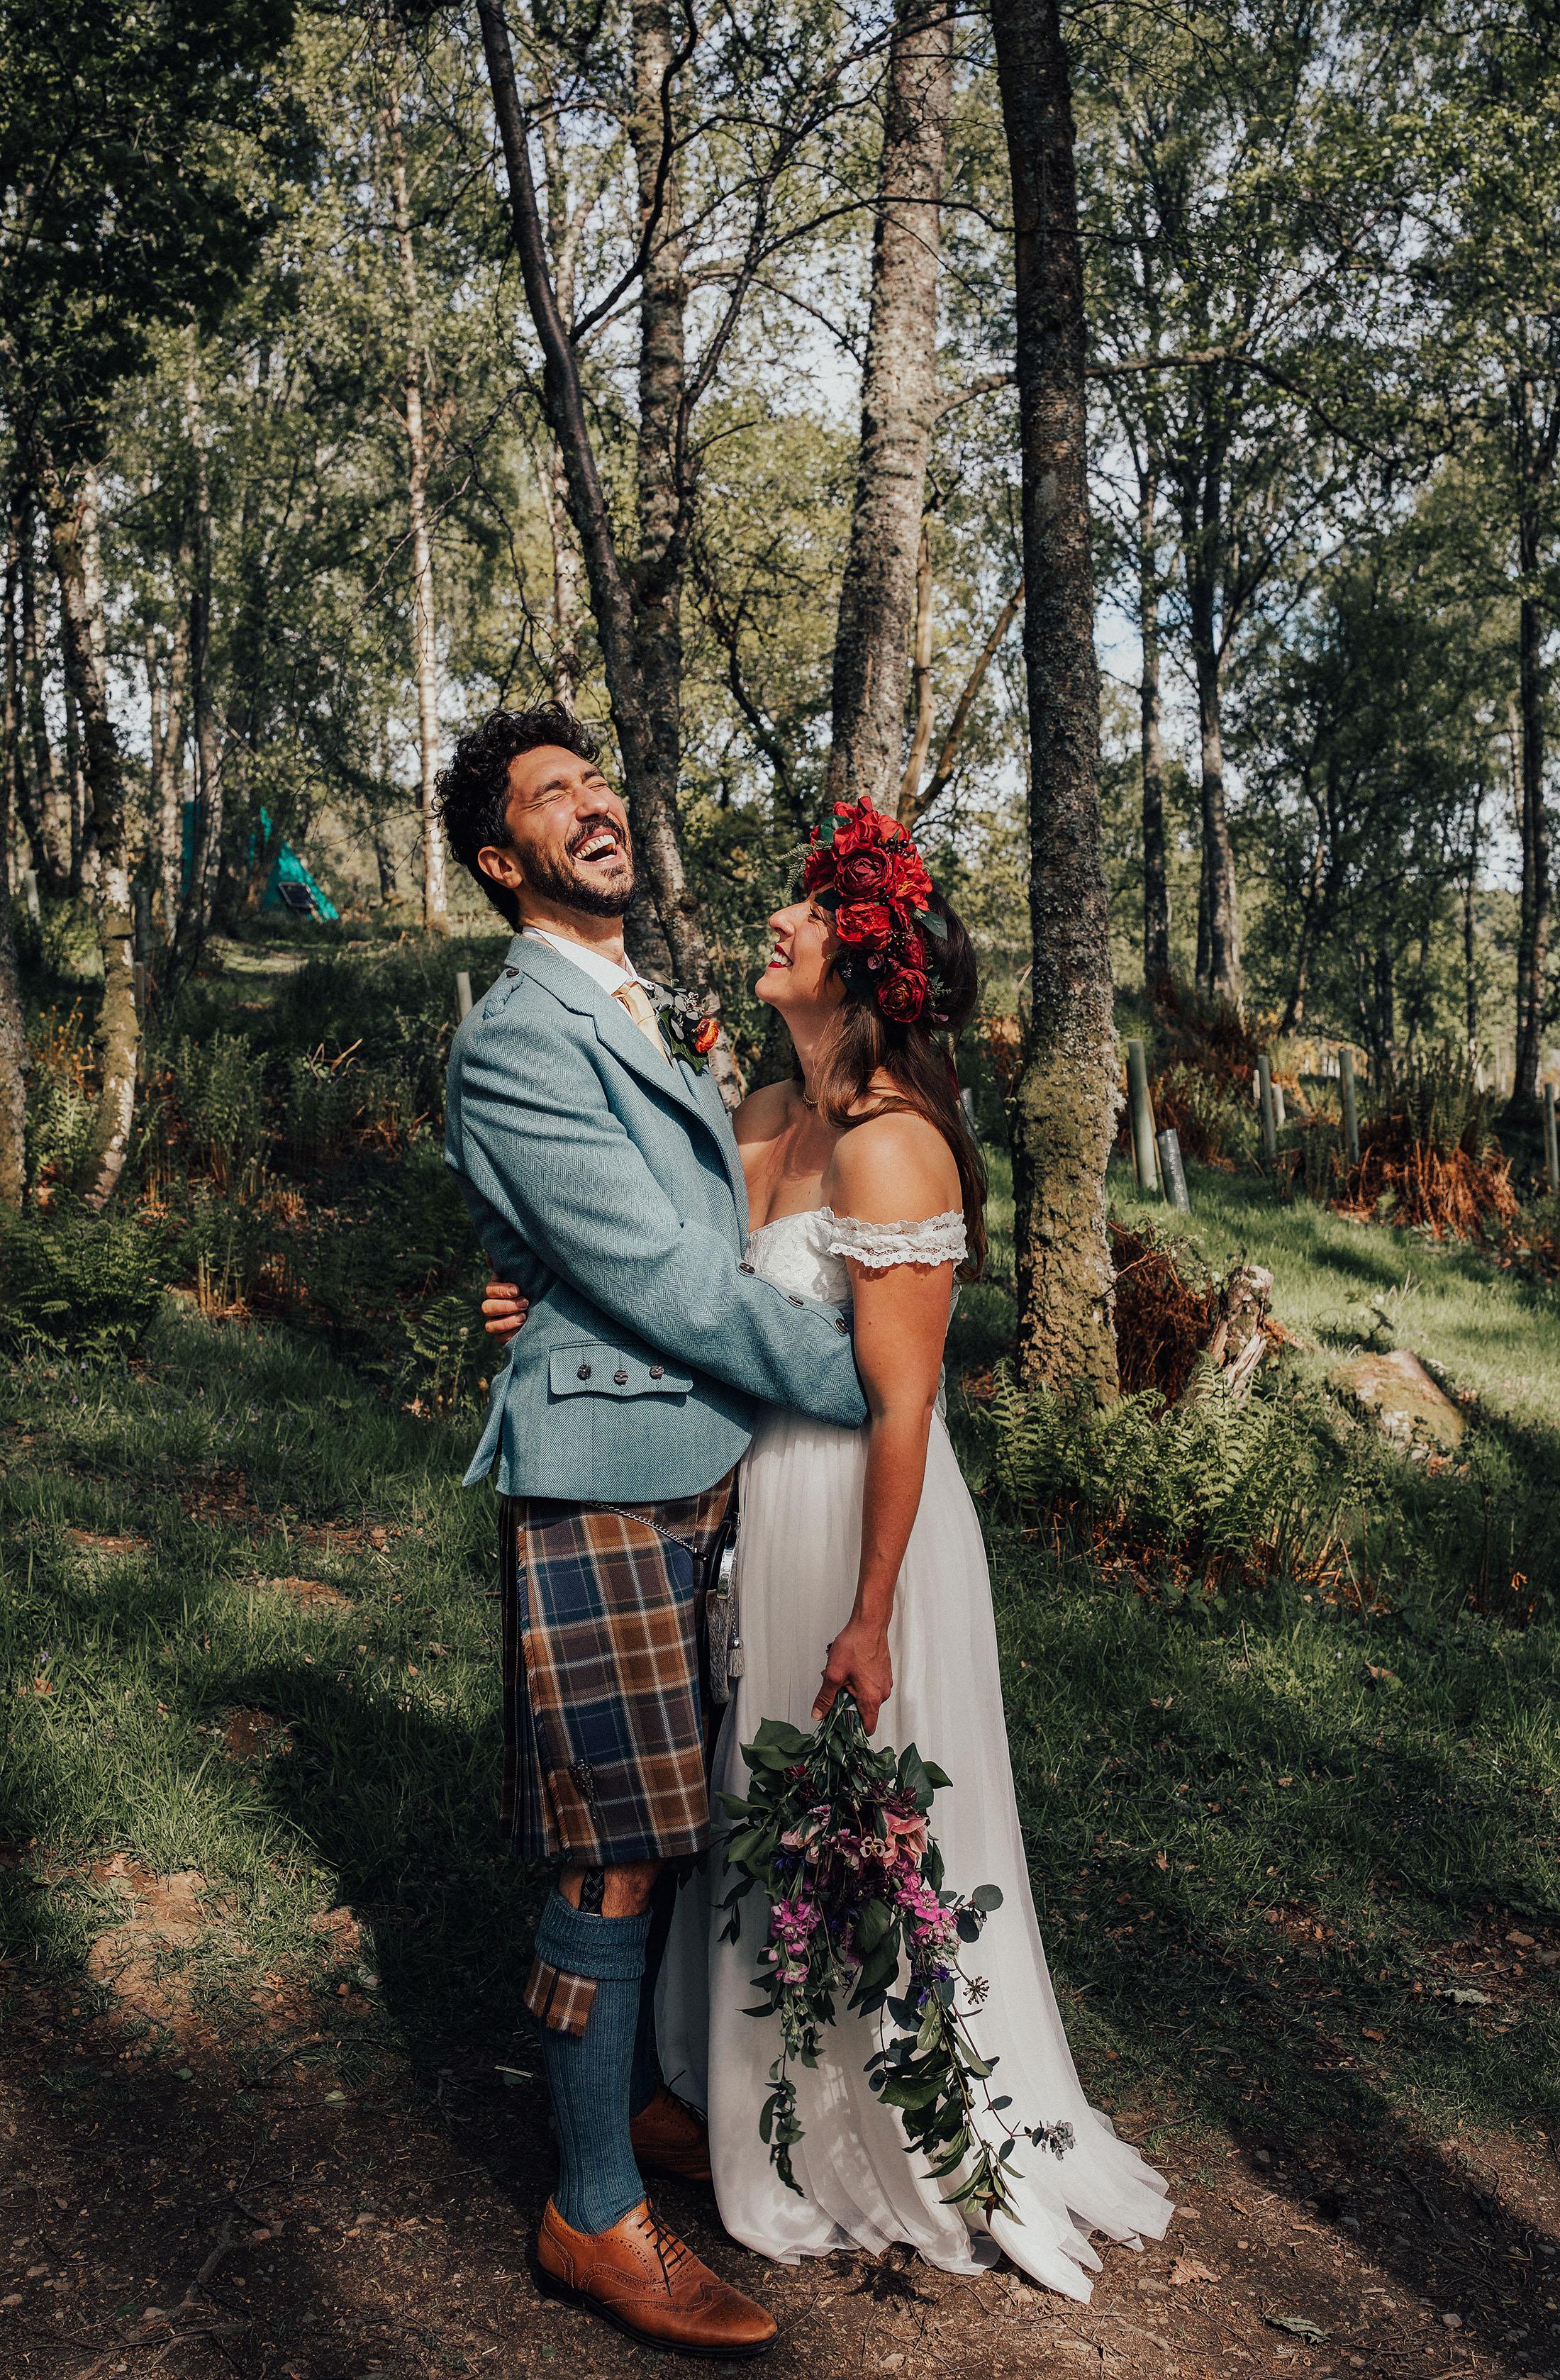 COMRIE_CROFT_WEDDINGS_PJ_PHILLIPS_PHOTOGRAPHY_103.jpg